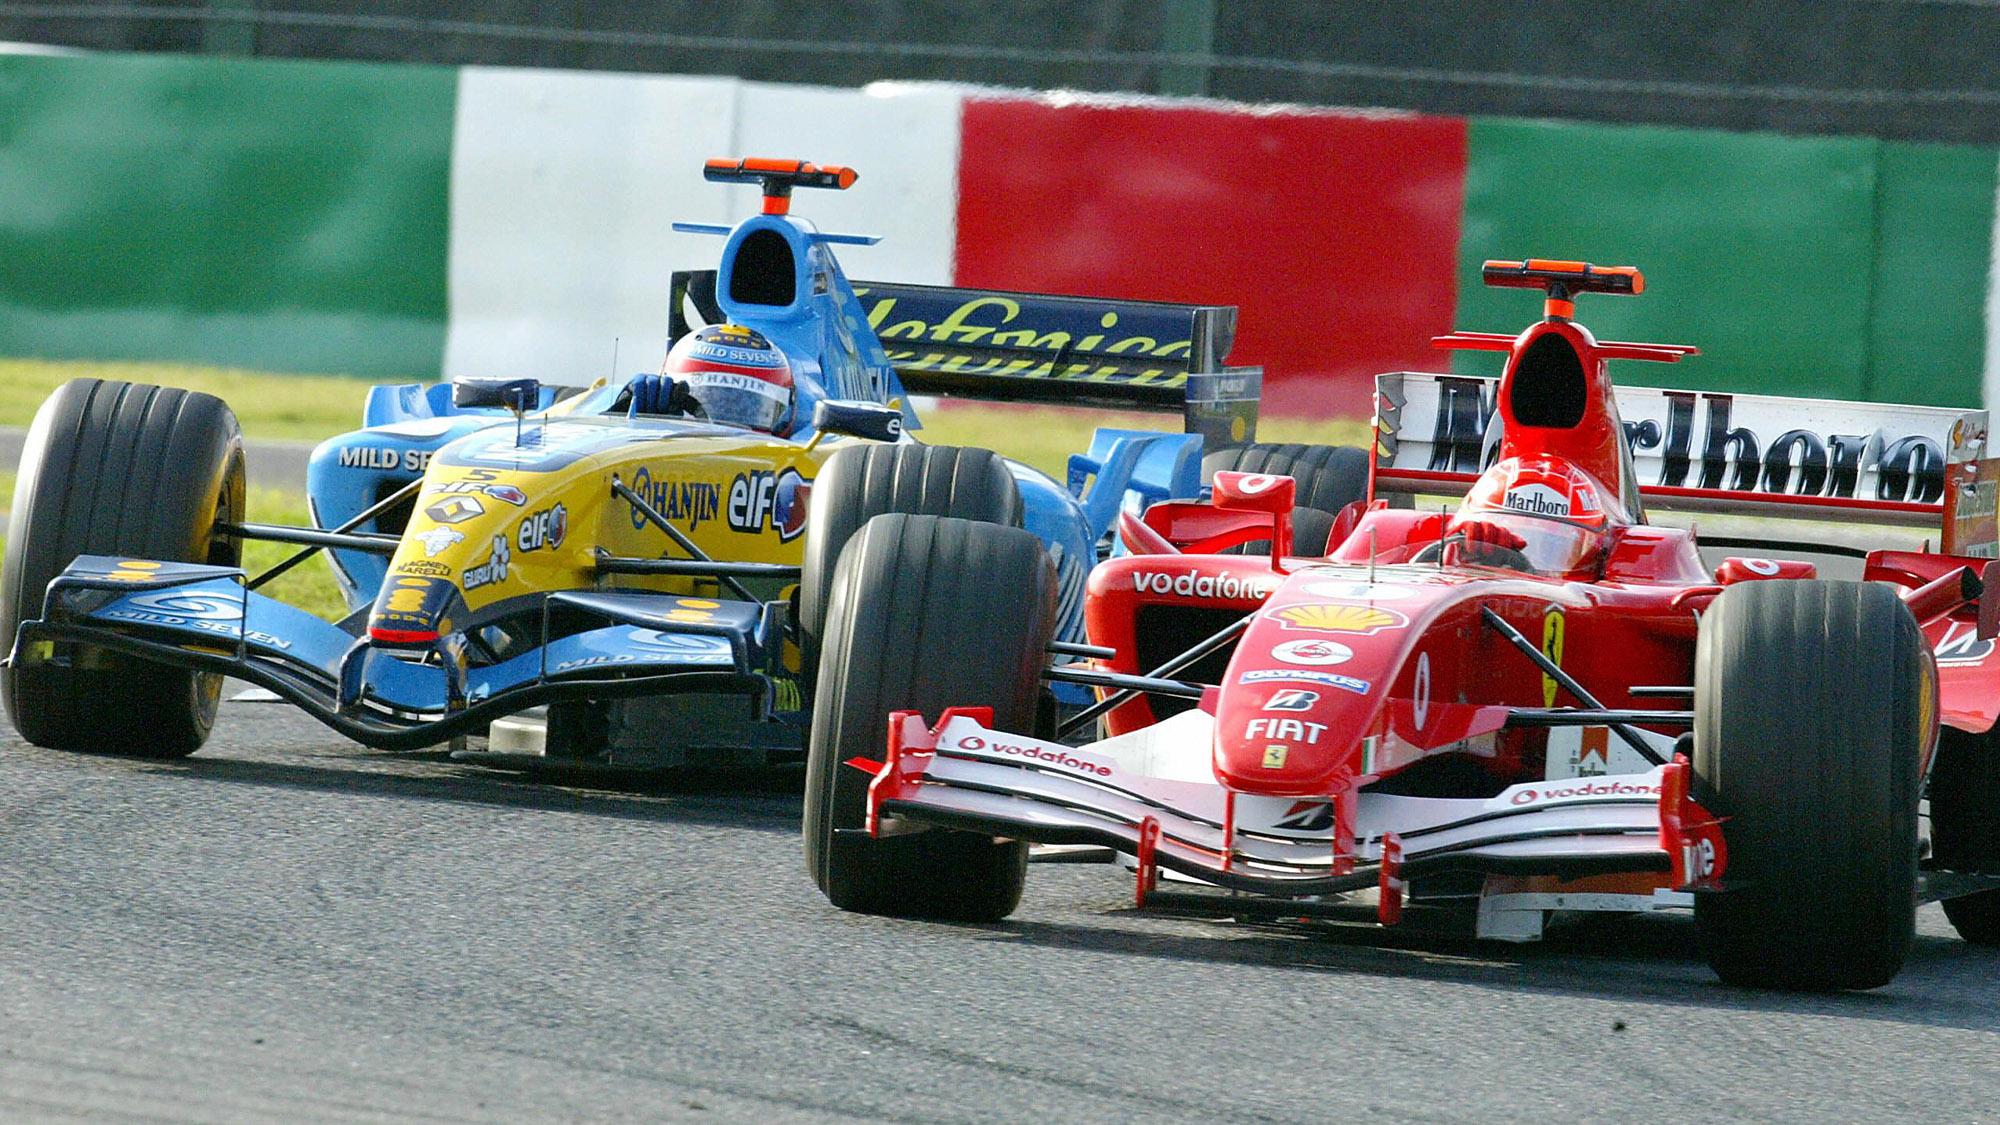 Fernando Alonso chases down Michael Schumacher in the 2005 Japanese Grand Prix at Suzuka